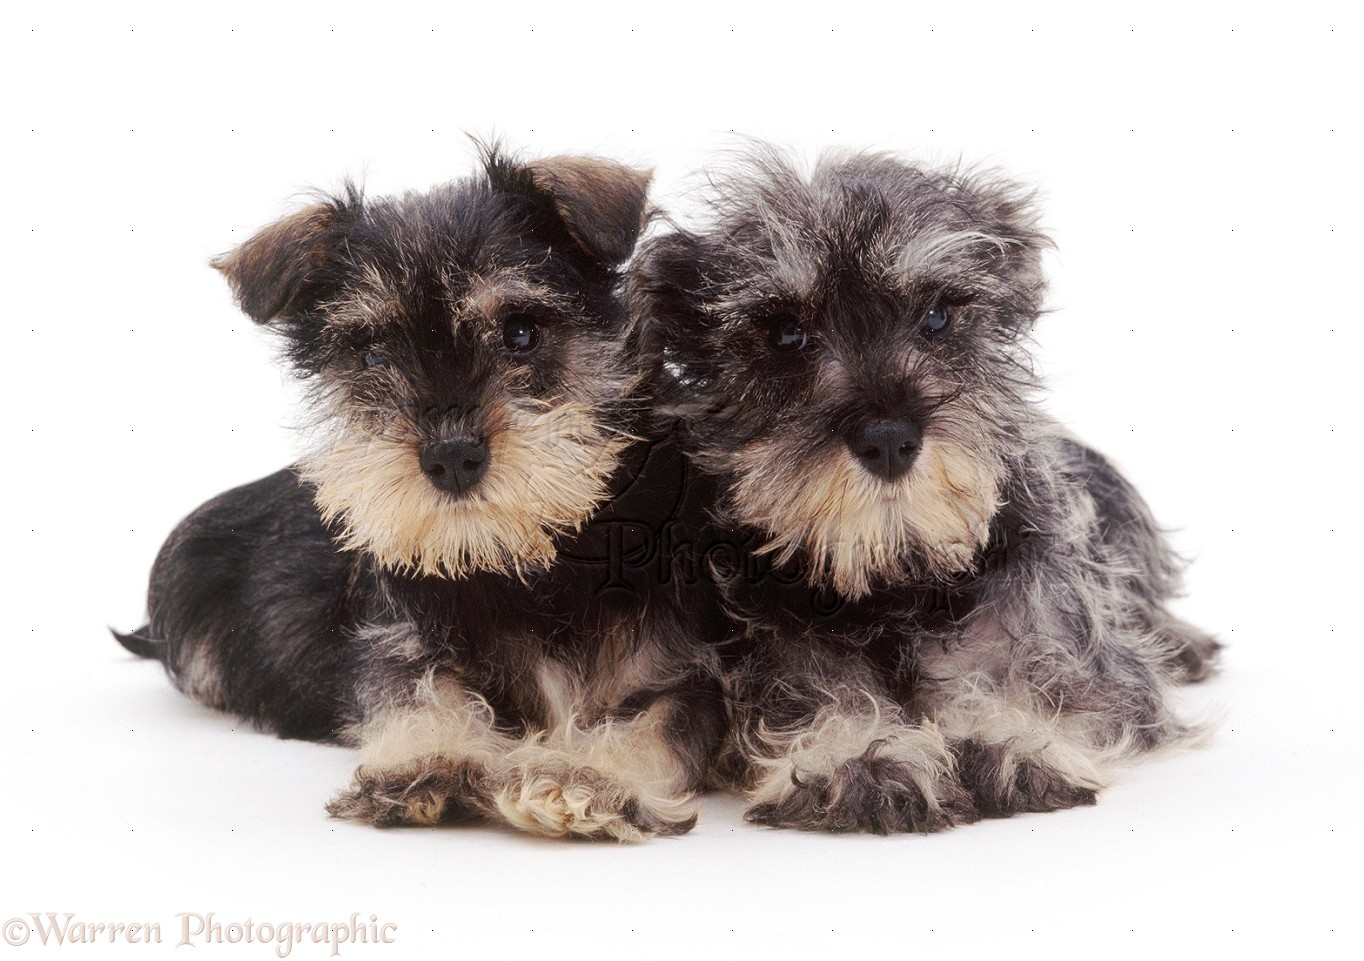 Dogs: Miniature Schnauzer pups, 8 weeks old photo WP15124